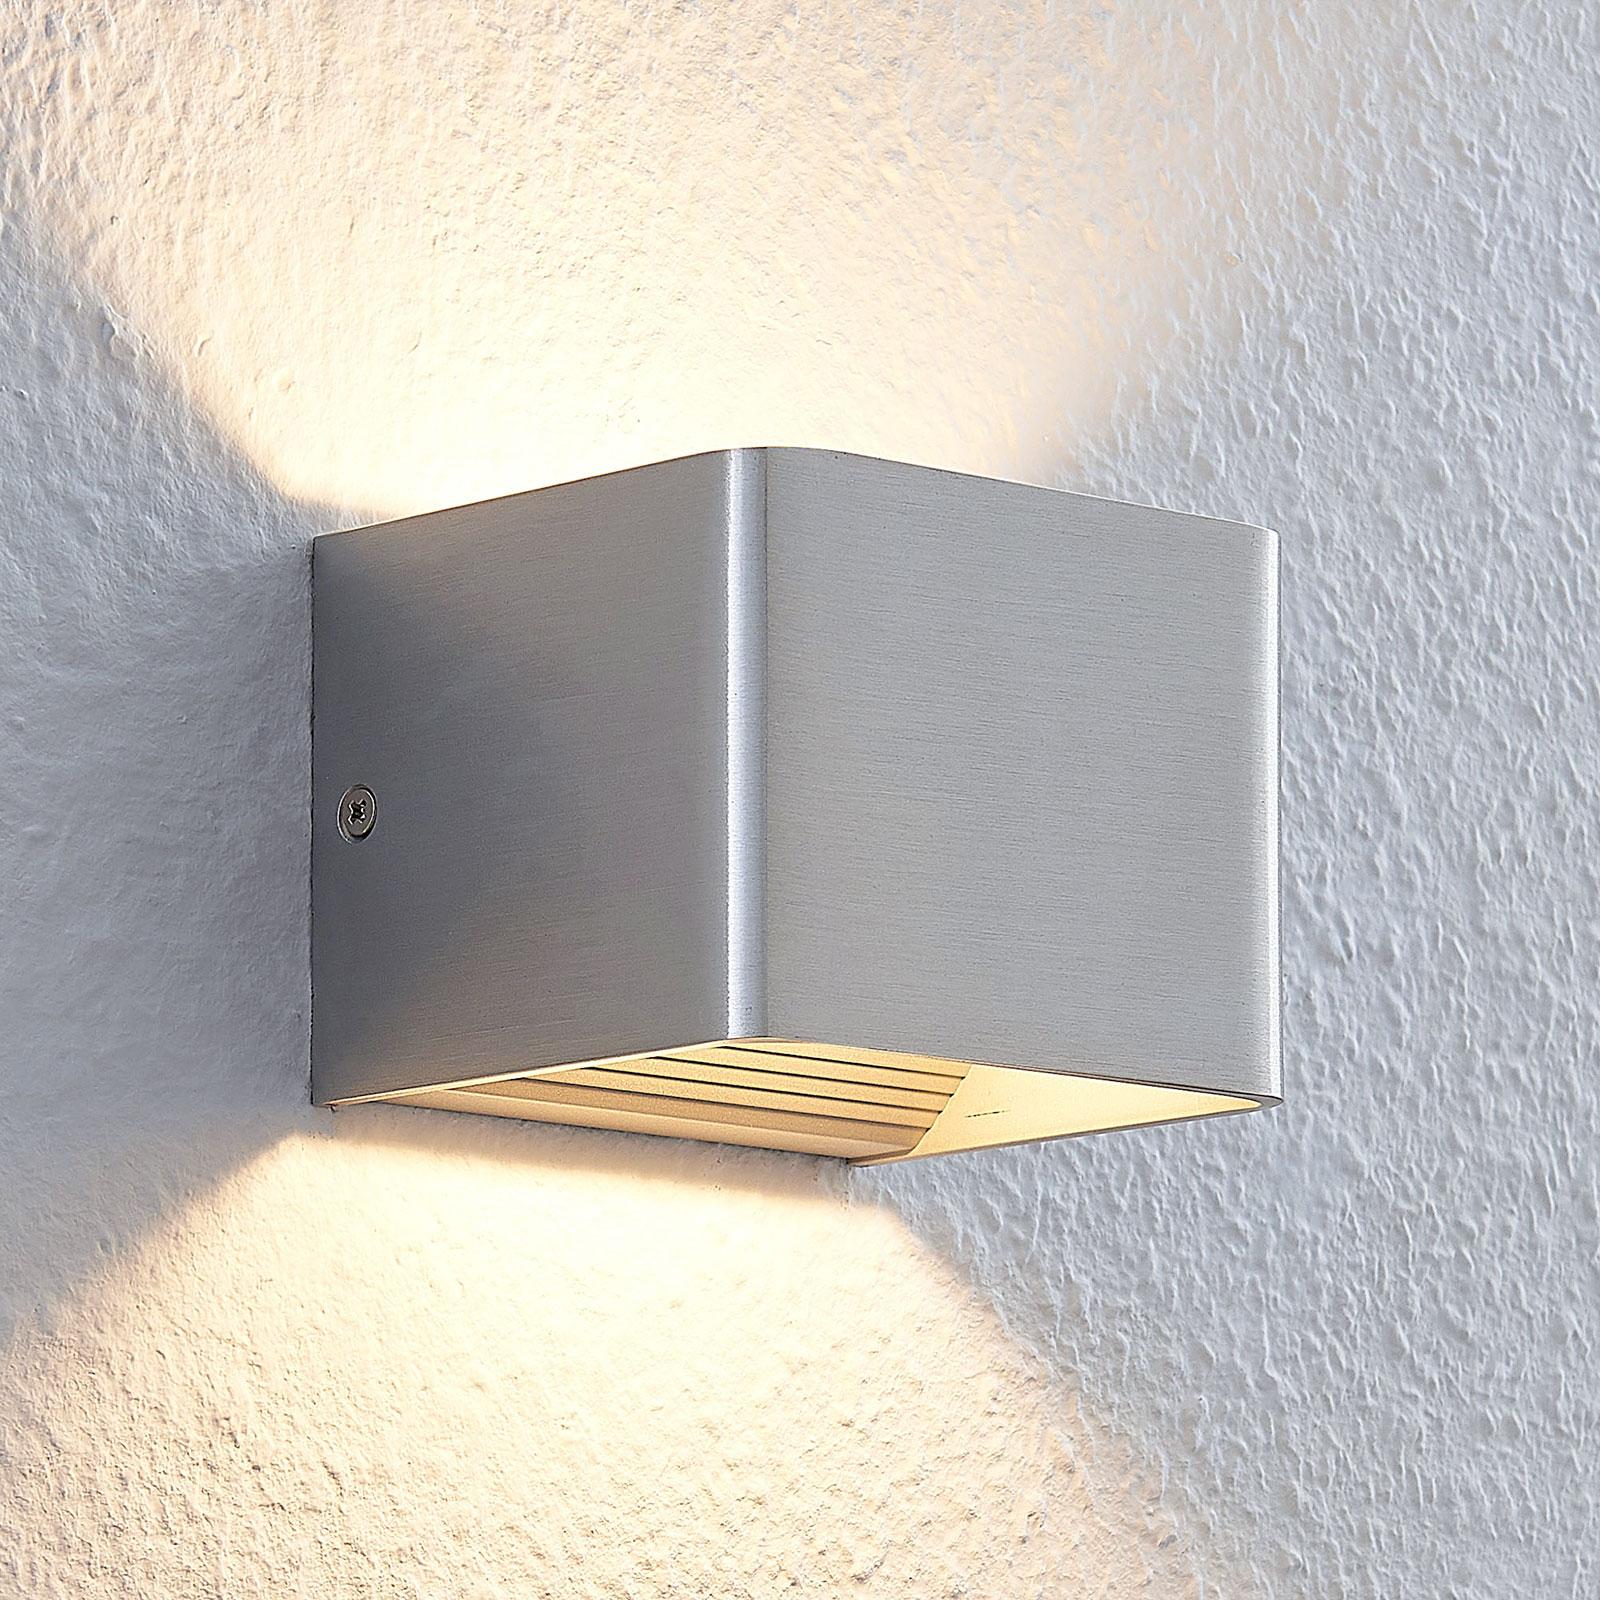 LED-Wandleuchte Lonisa, nickel, 10 cm